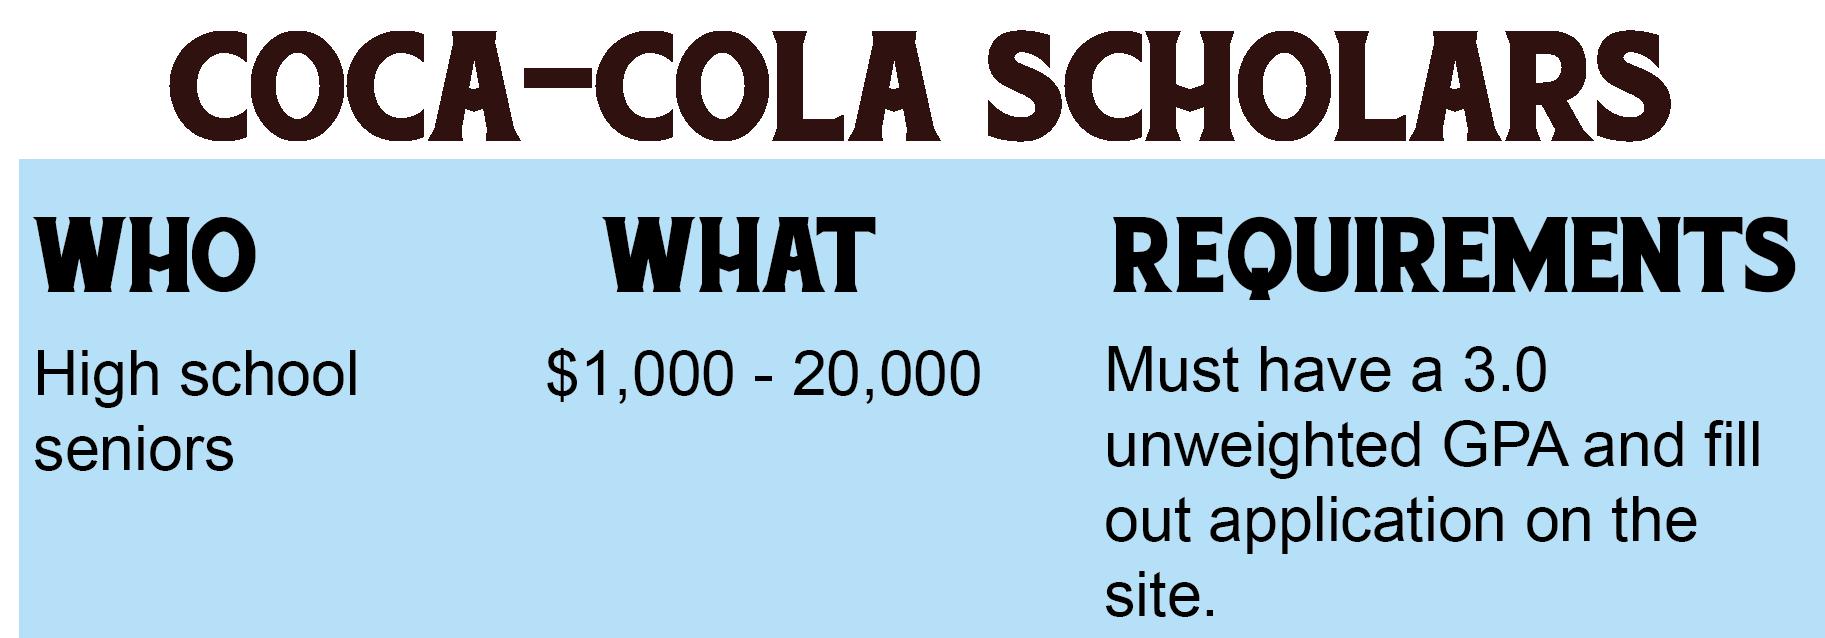 Coca-Cola Scholars Scholarship